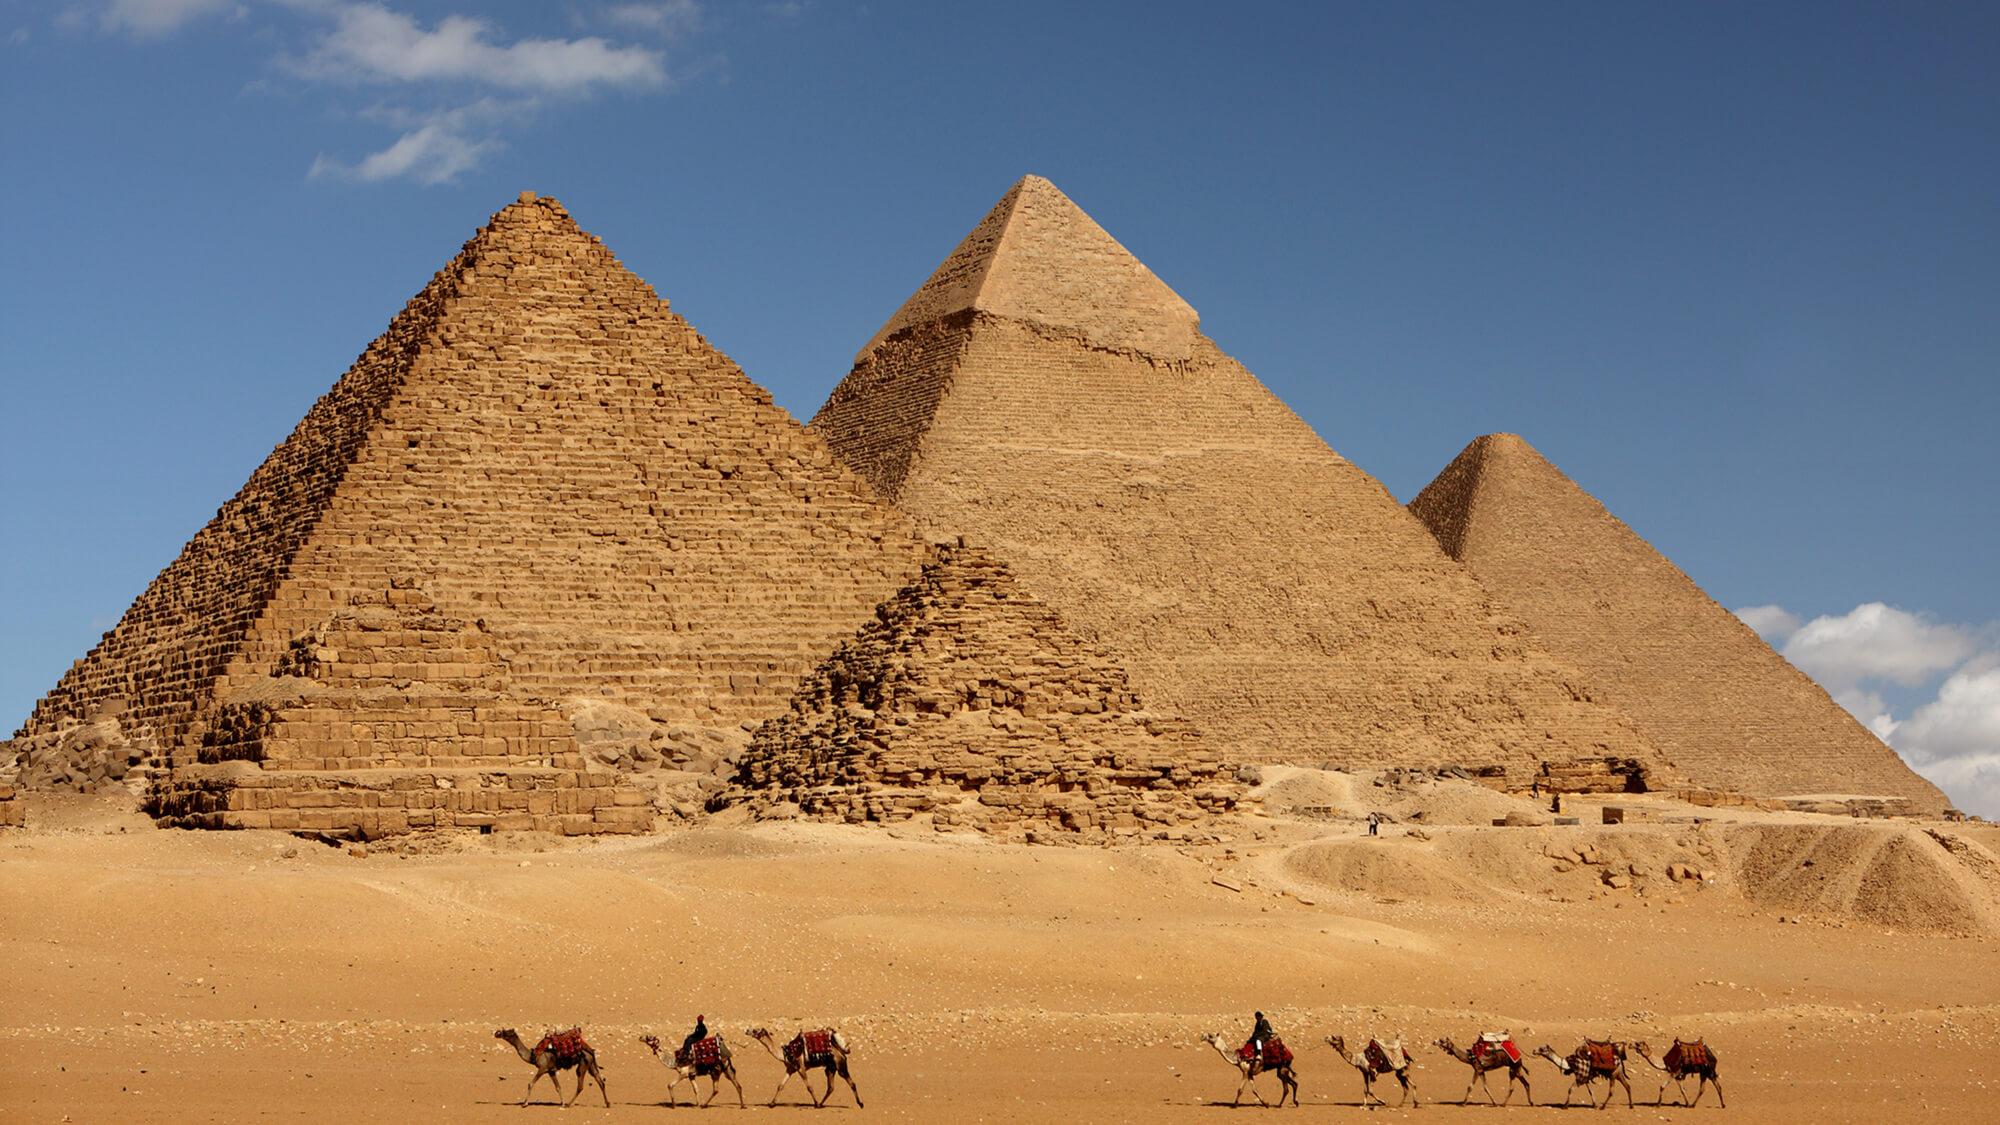 , Steigenberger Hotels & Resorts: New hotel in Egypt, Buzz travel | eTurboNews |Travel News